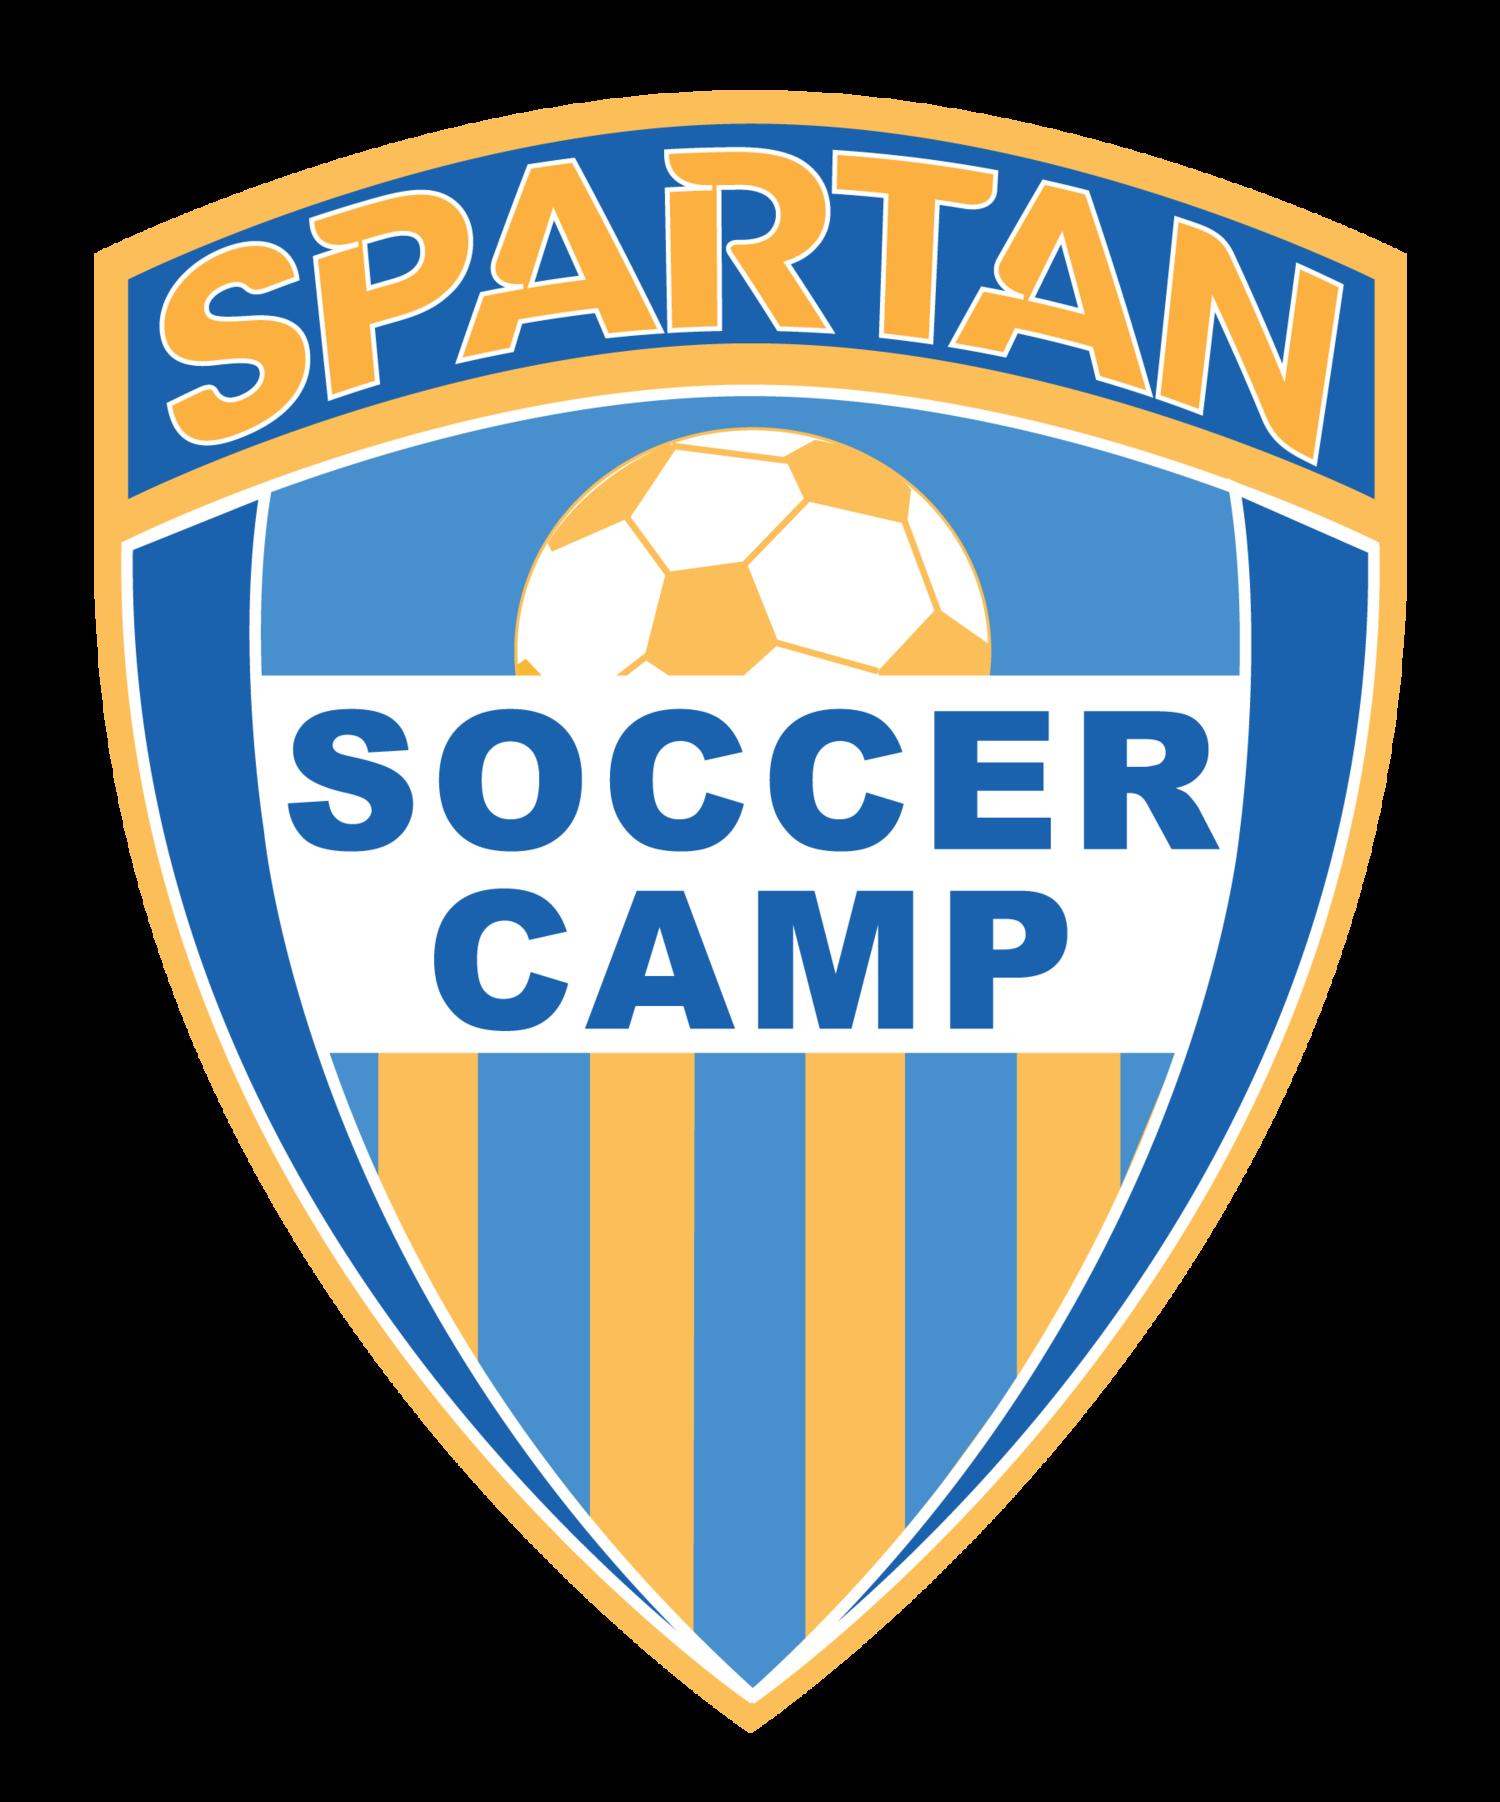 Sjsu Summer 2020.Spartan Soccer Camp